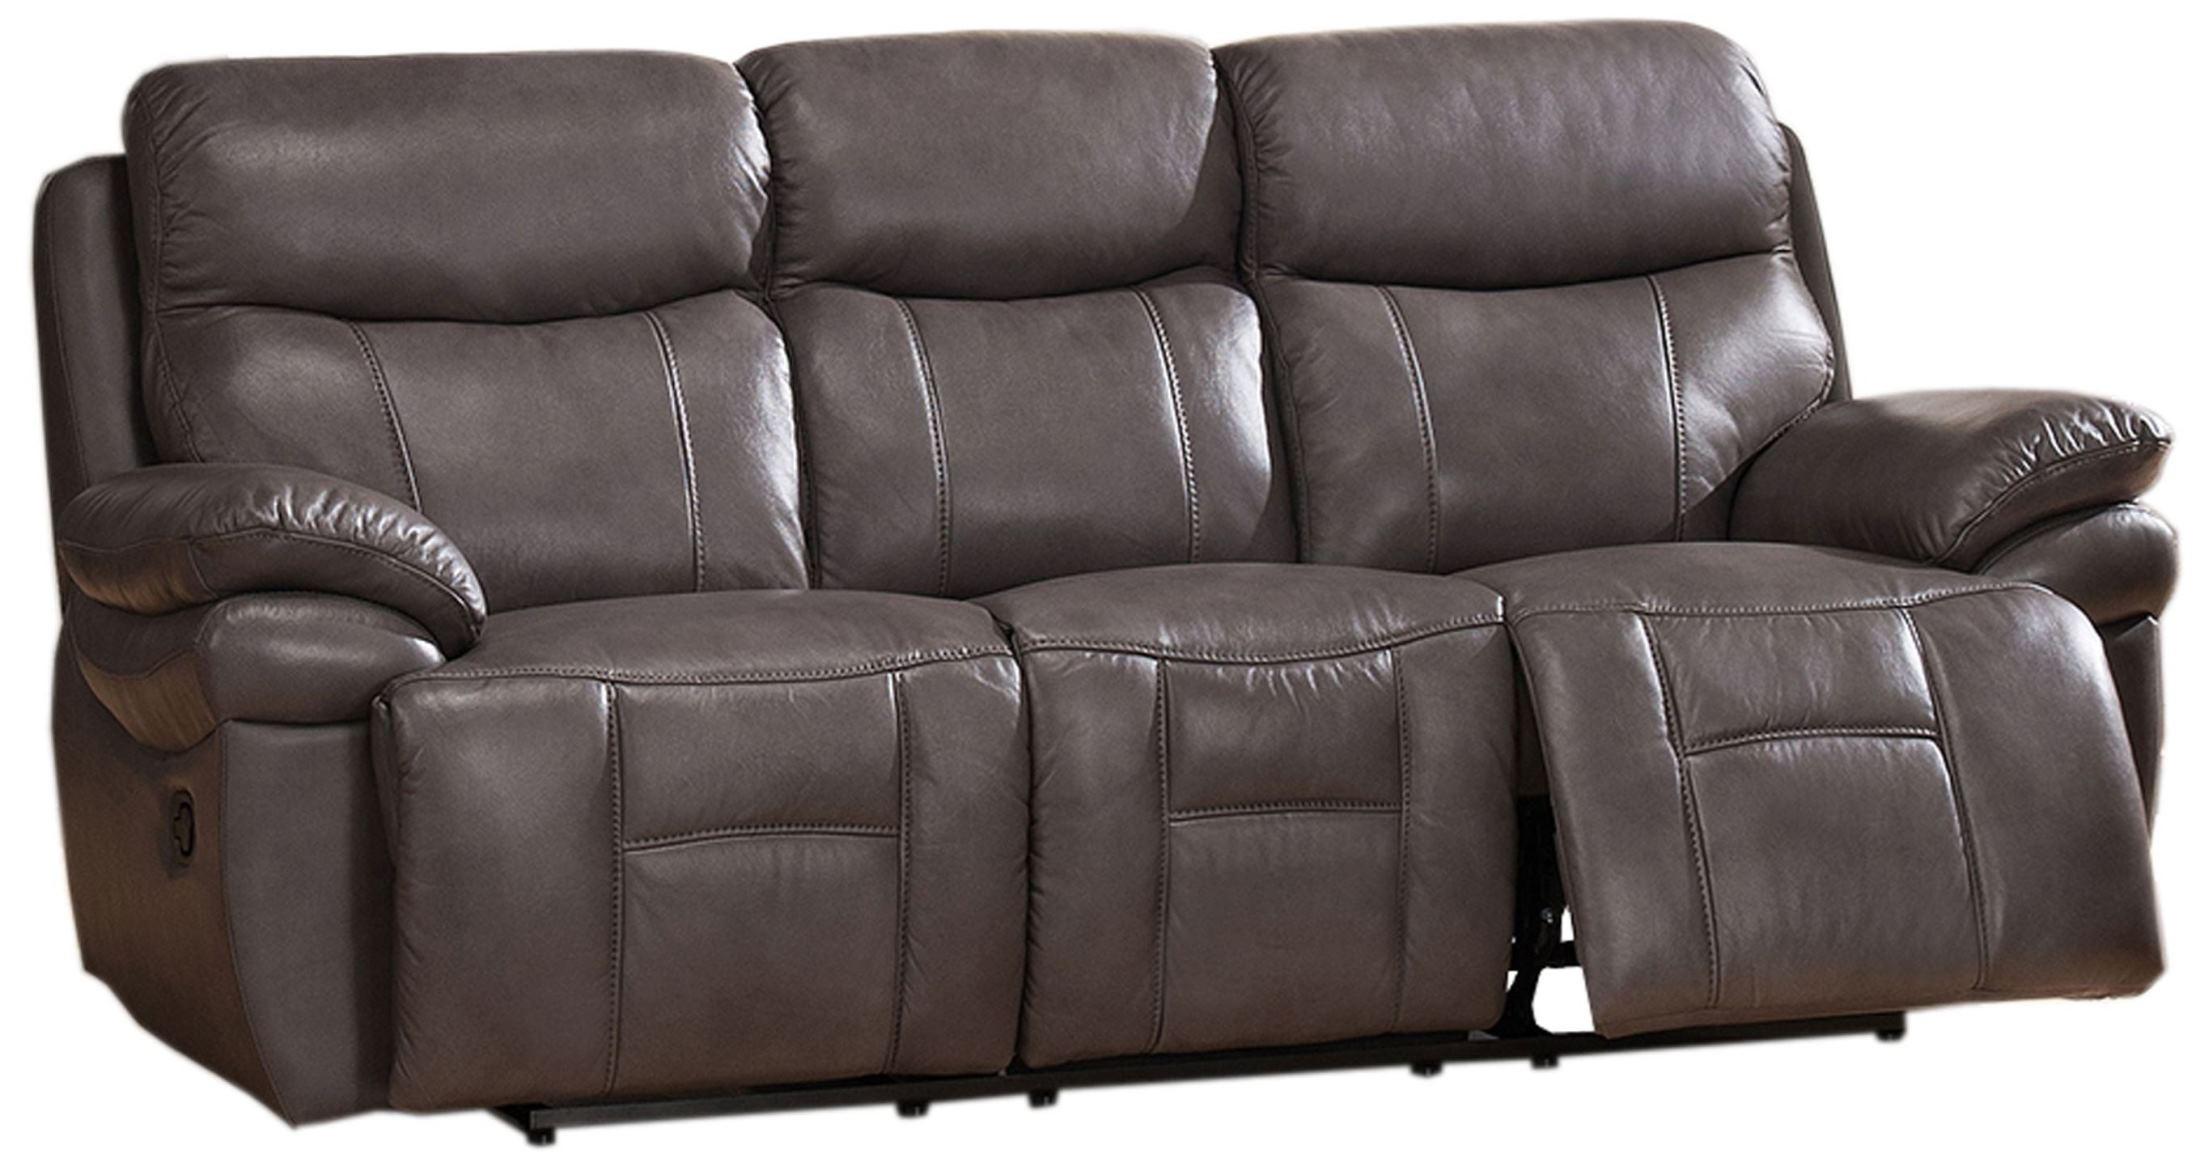 Grey Reclining Sectional Sofa Cortez Premium Top Grain